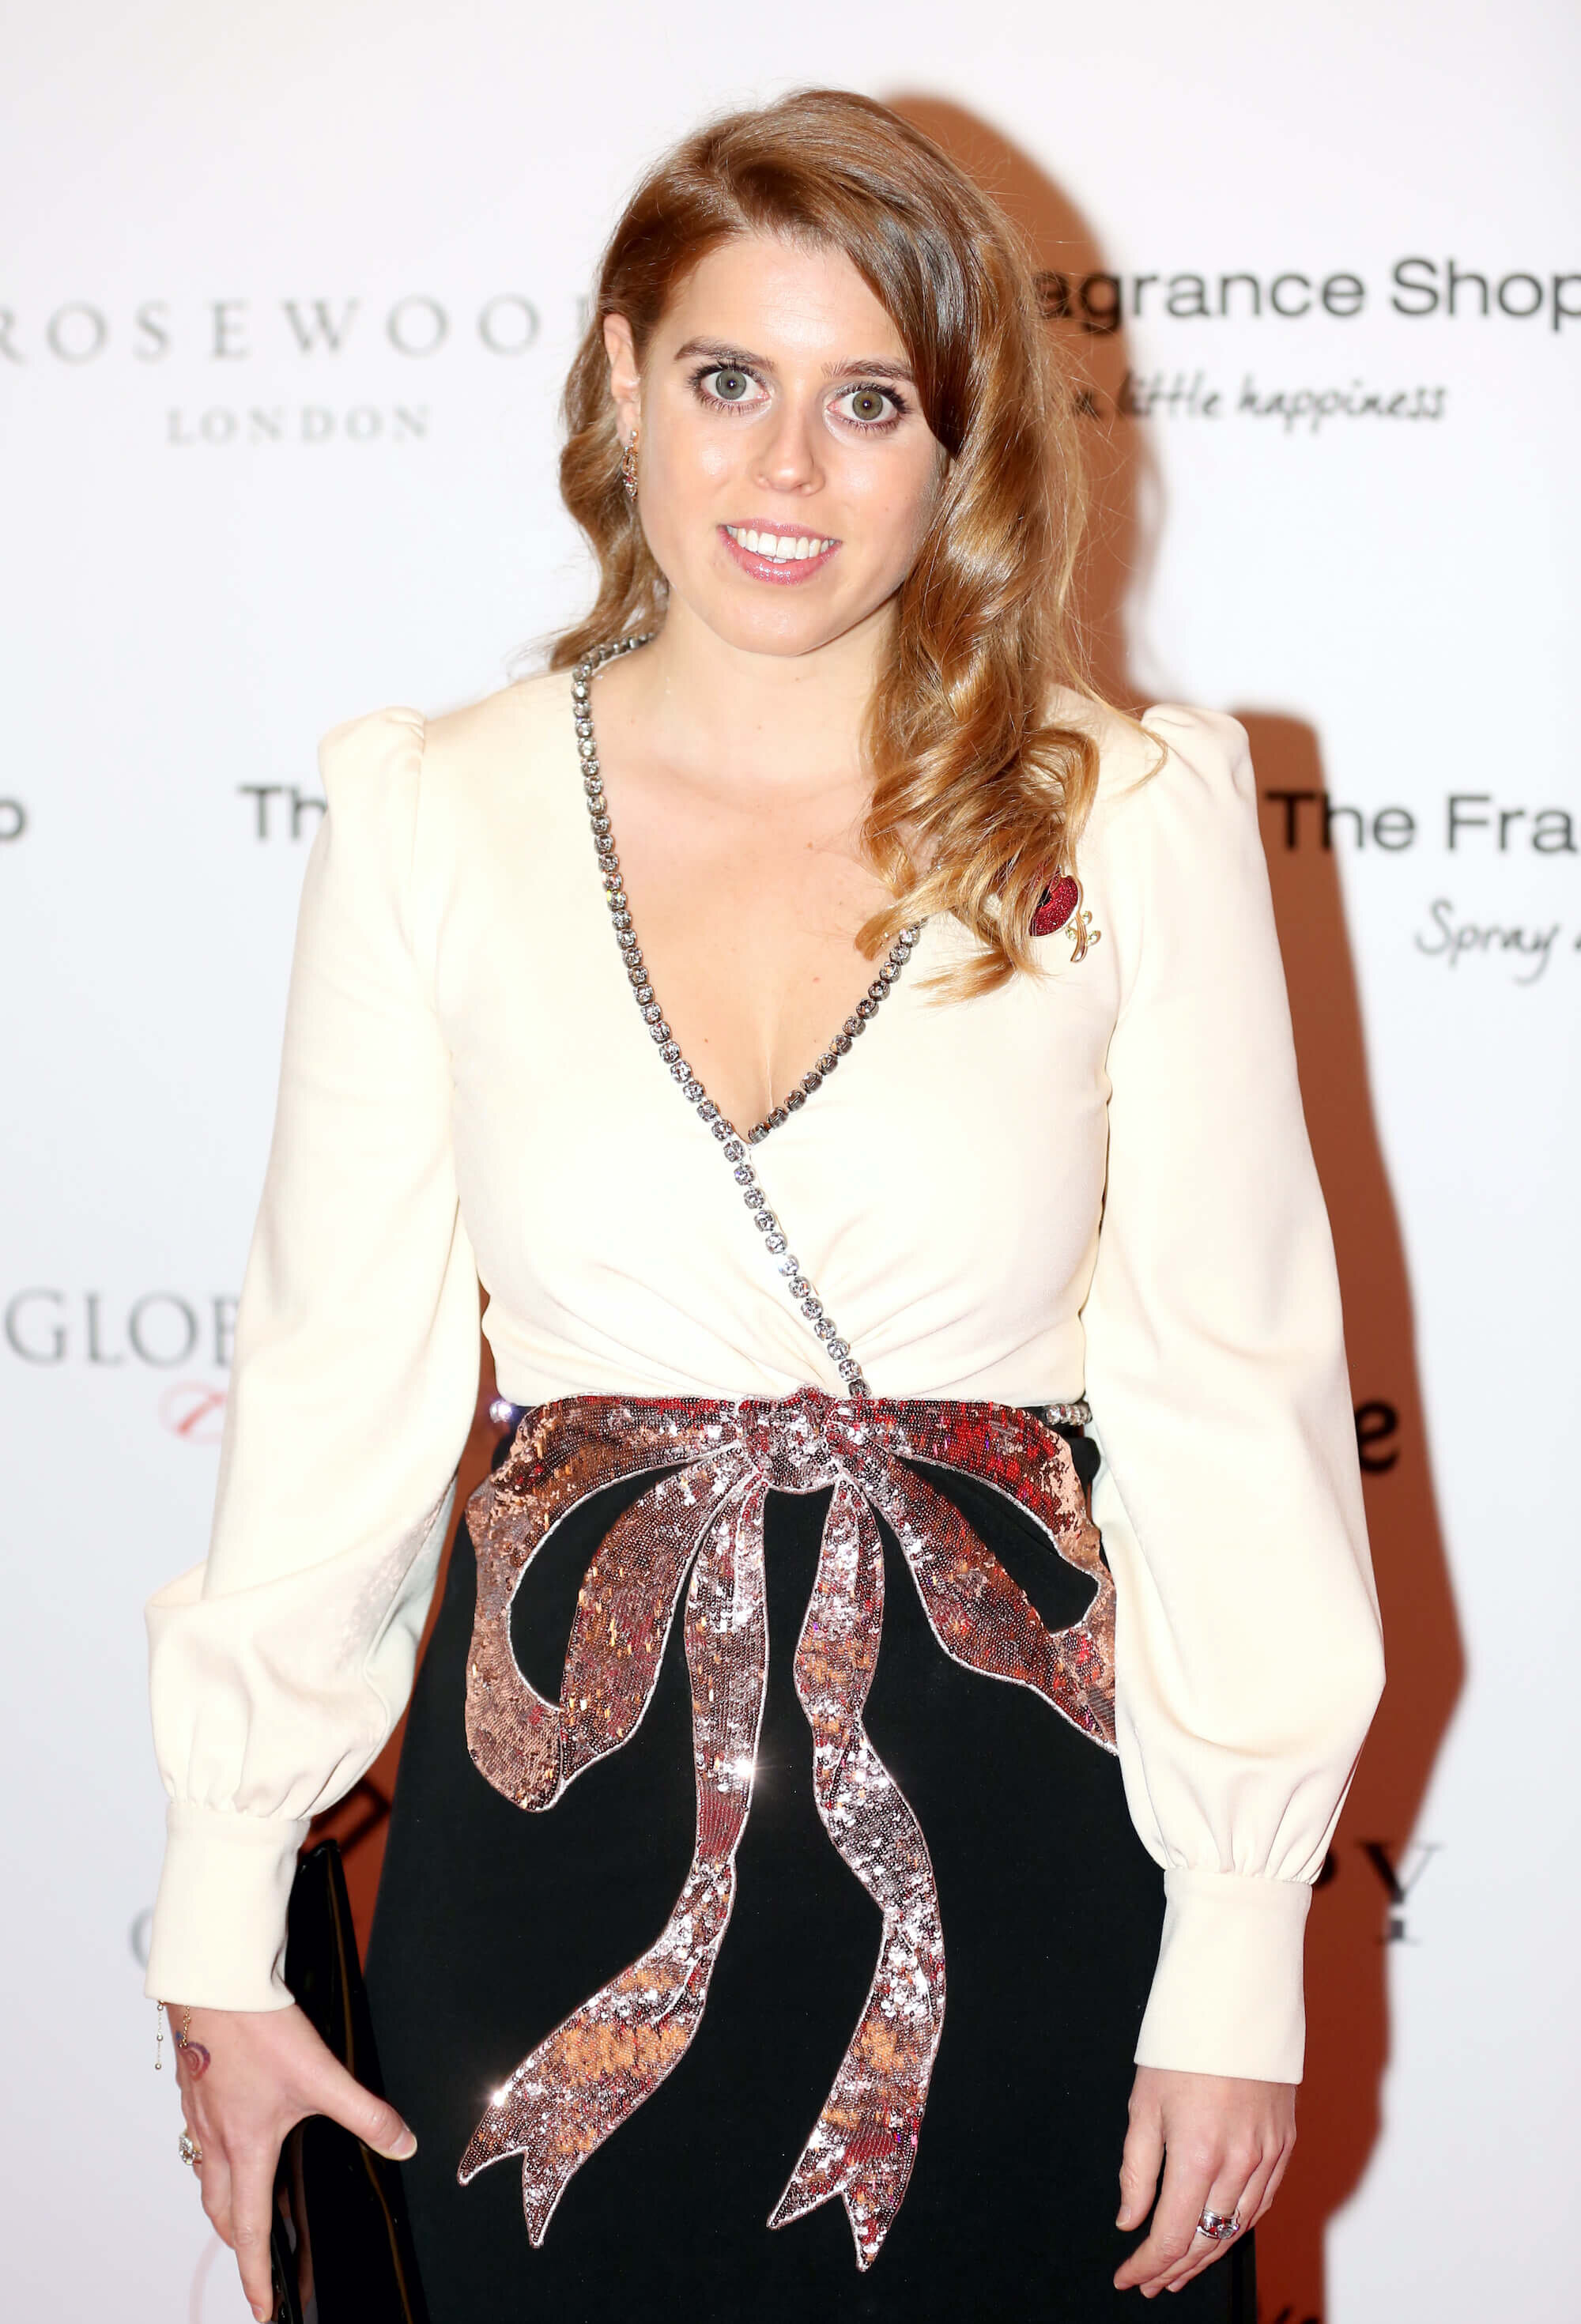 Prinzessin Beatrice wird in wenigen Monaten den Grafen Edoardo Mapelli Mozzi heiraten.  © picture alliance / empics